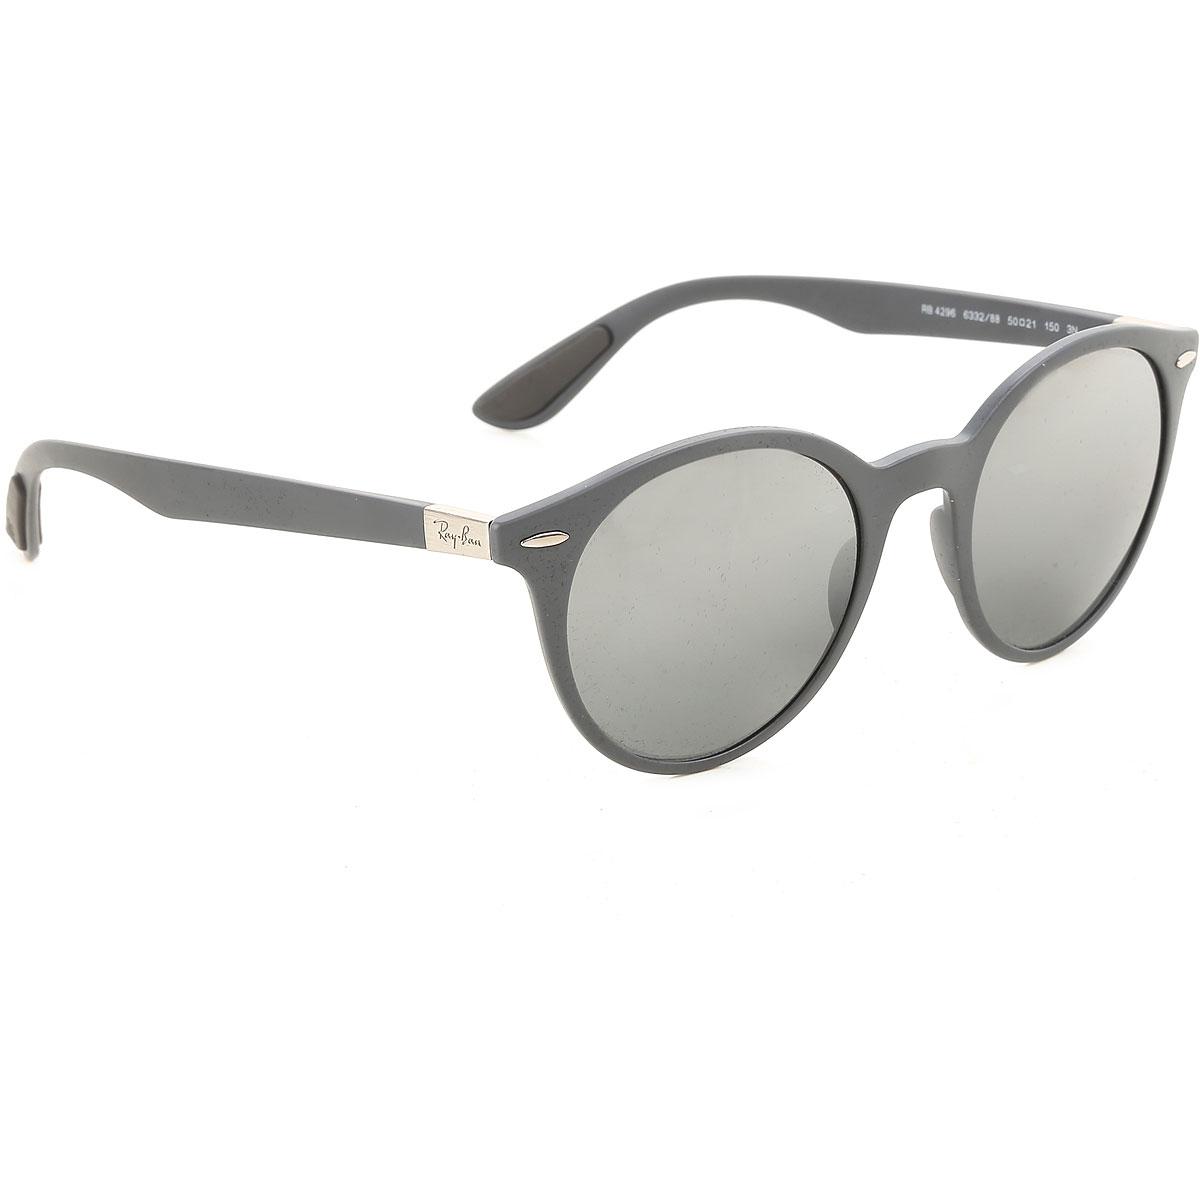 Ray Ban Sunglasses On Sale, Matt Grey, 2019